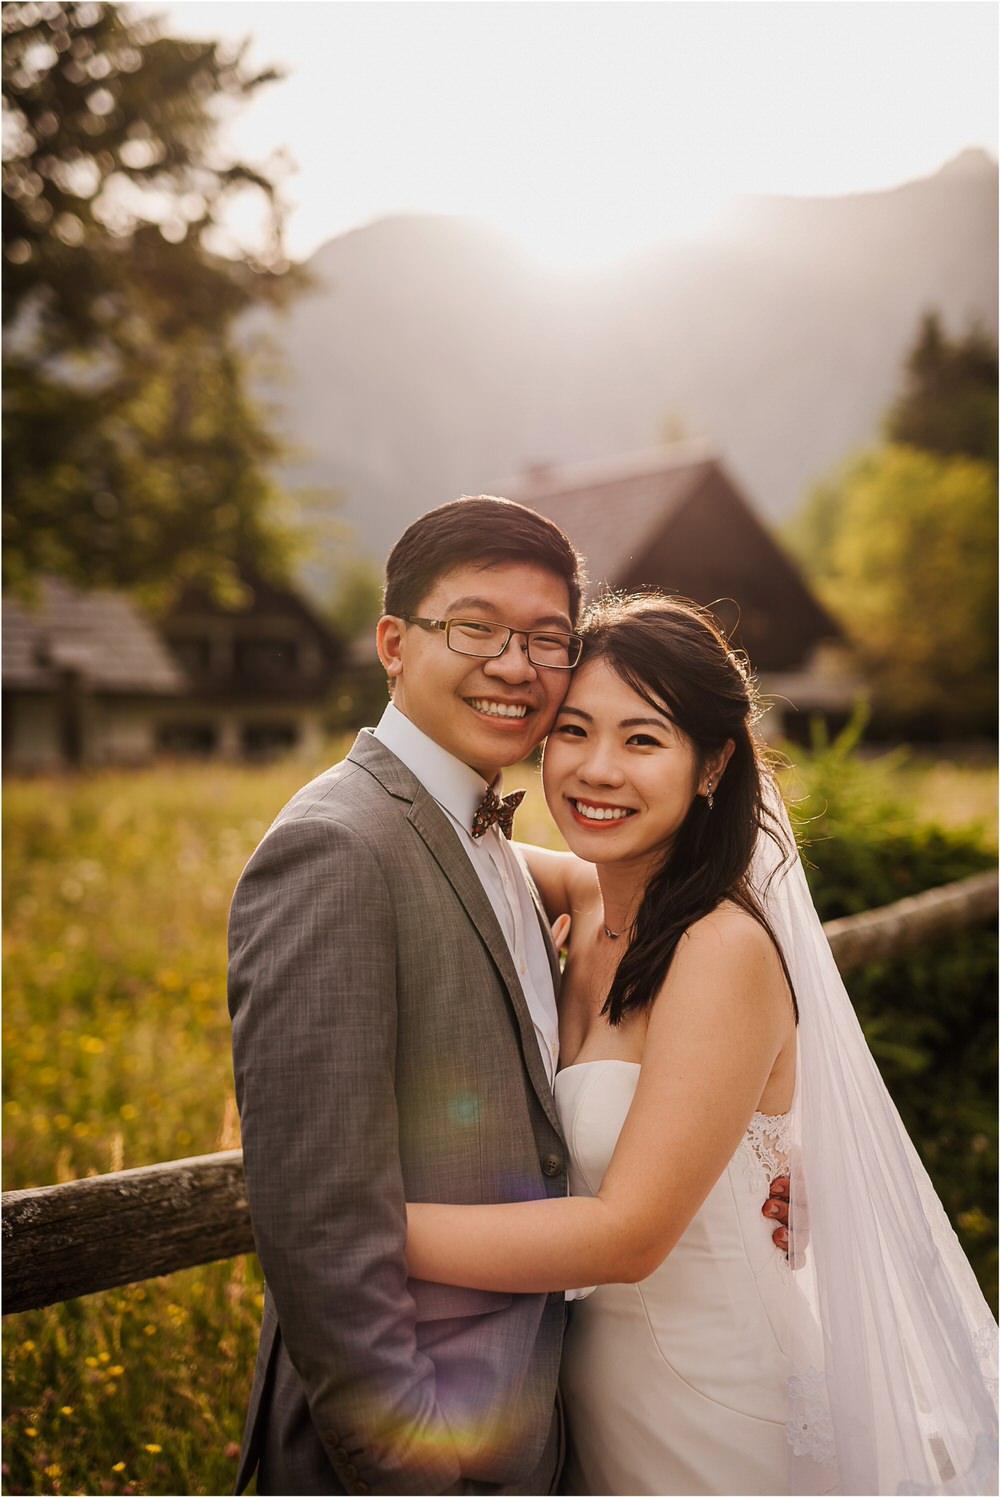 prewedding bled lake slovenia asian couple ljubljana engagement singapore love bohinj lake 0049.jpg